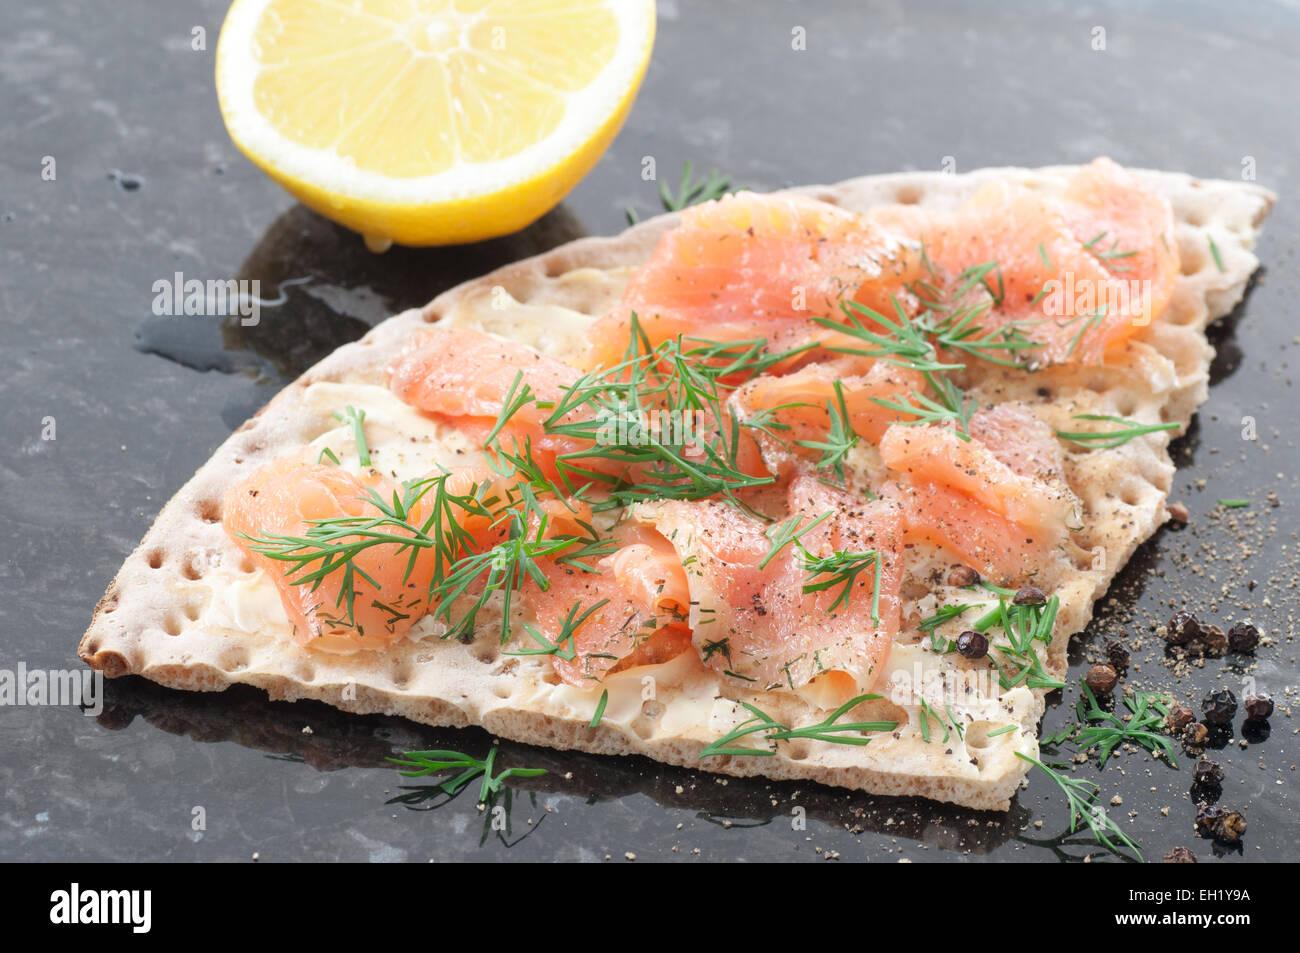 Marinated salmon, dill and black pepper on crispbread. - Stock Image